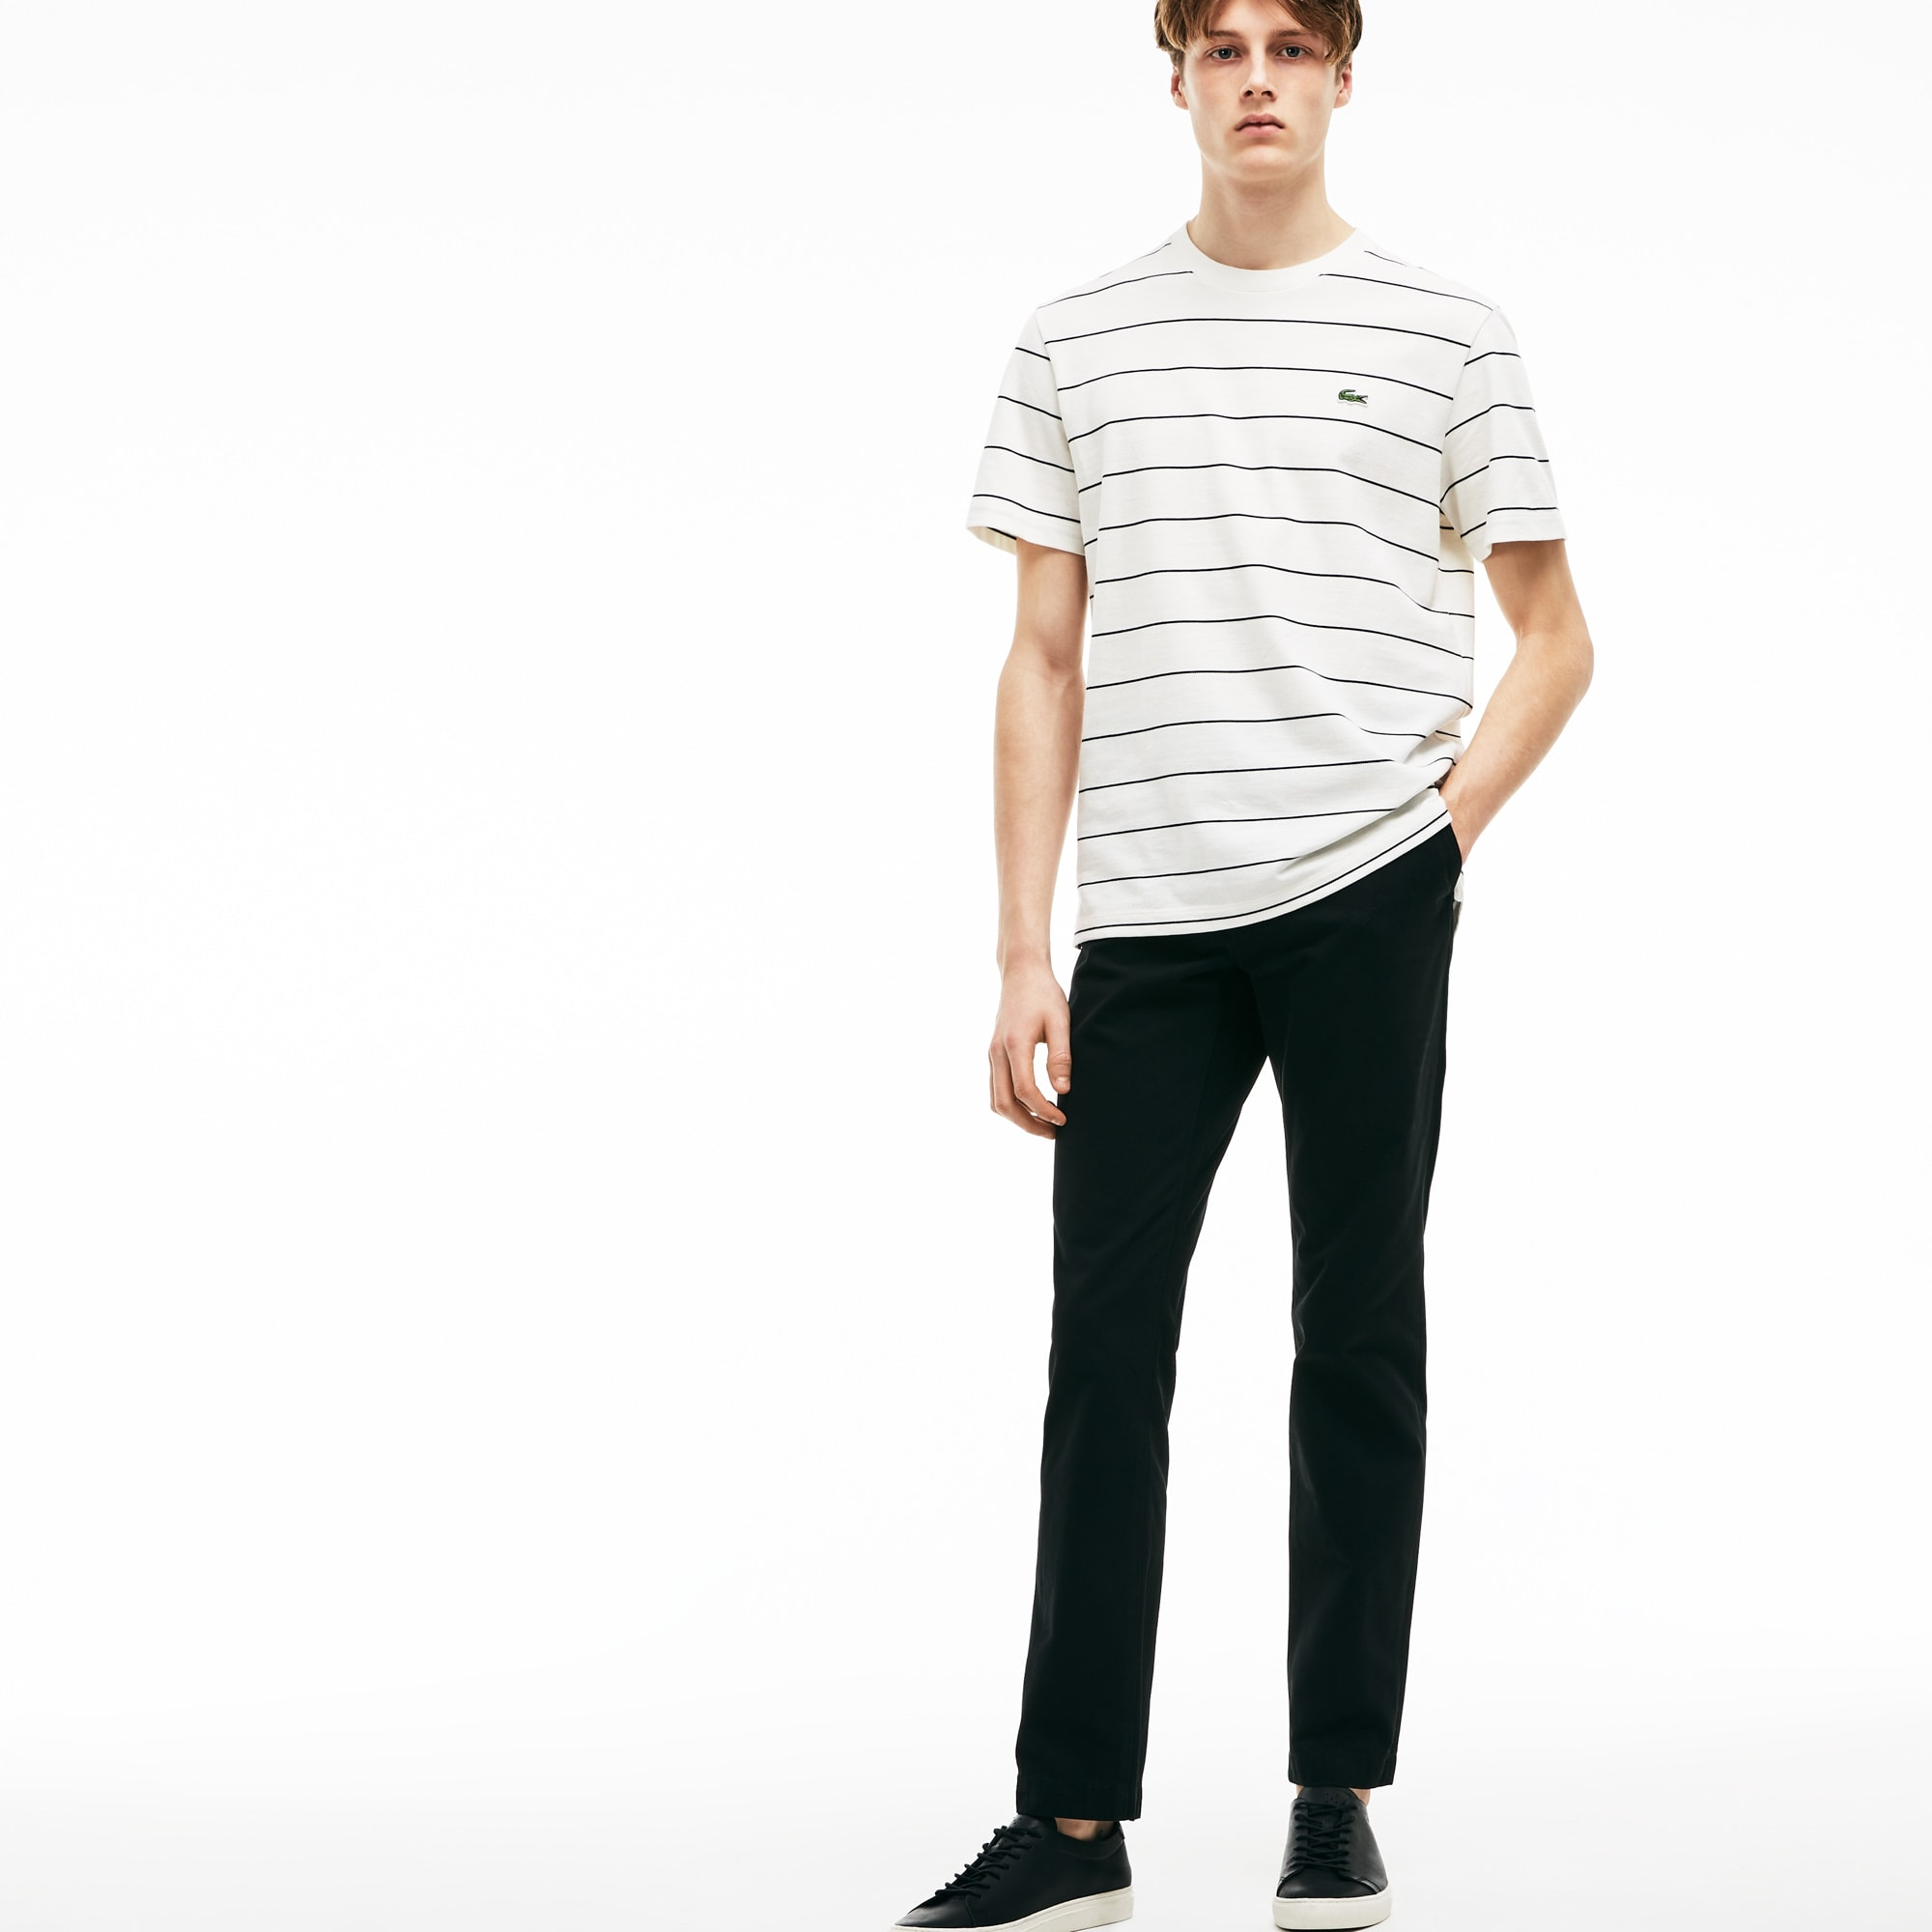 a74190fb9e Men'S Regular Fit Chino Pants in Black